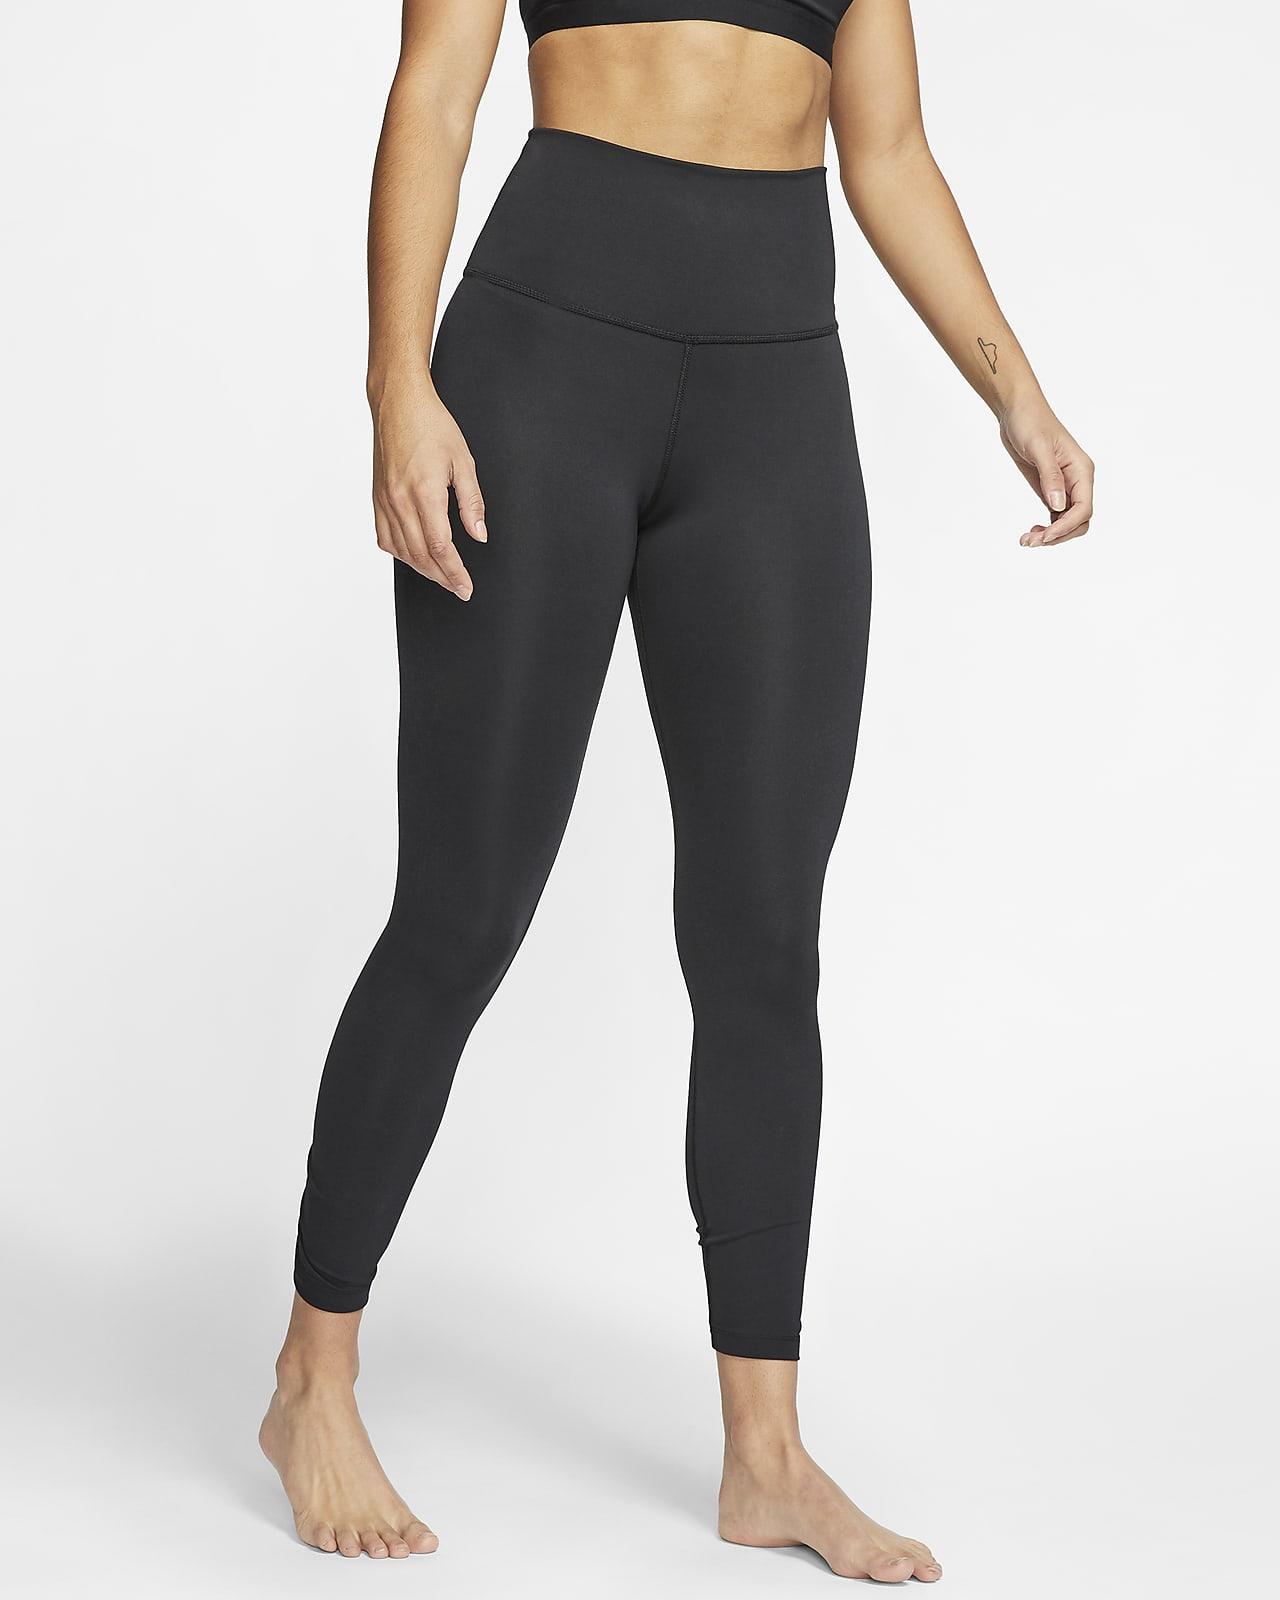 Nike Yoga Women's Ruched 7/8 Leggings